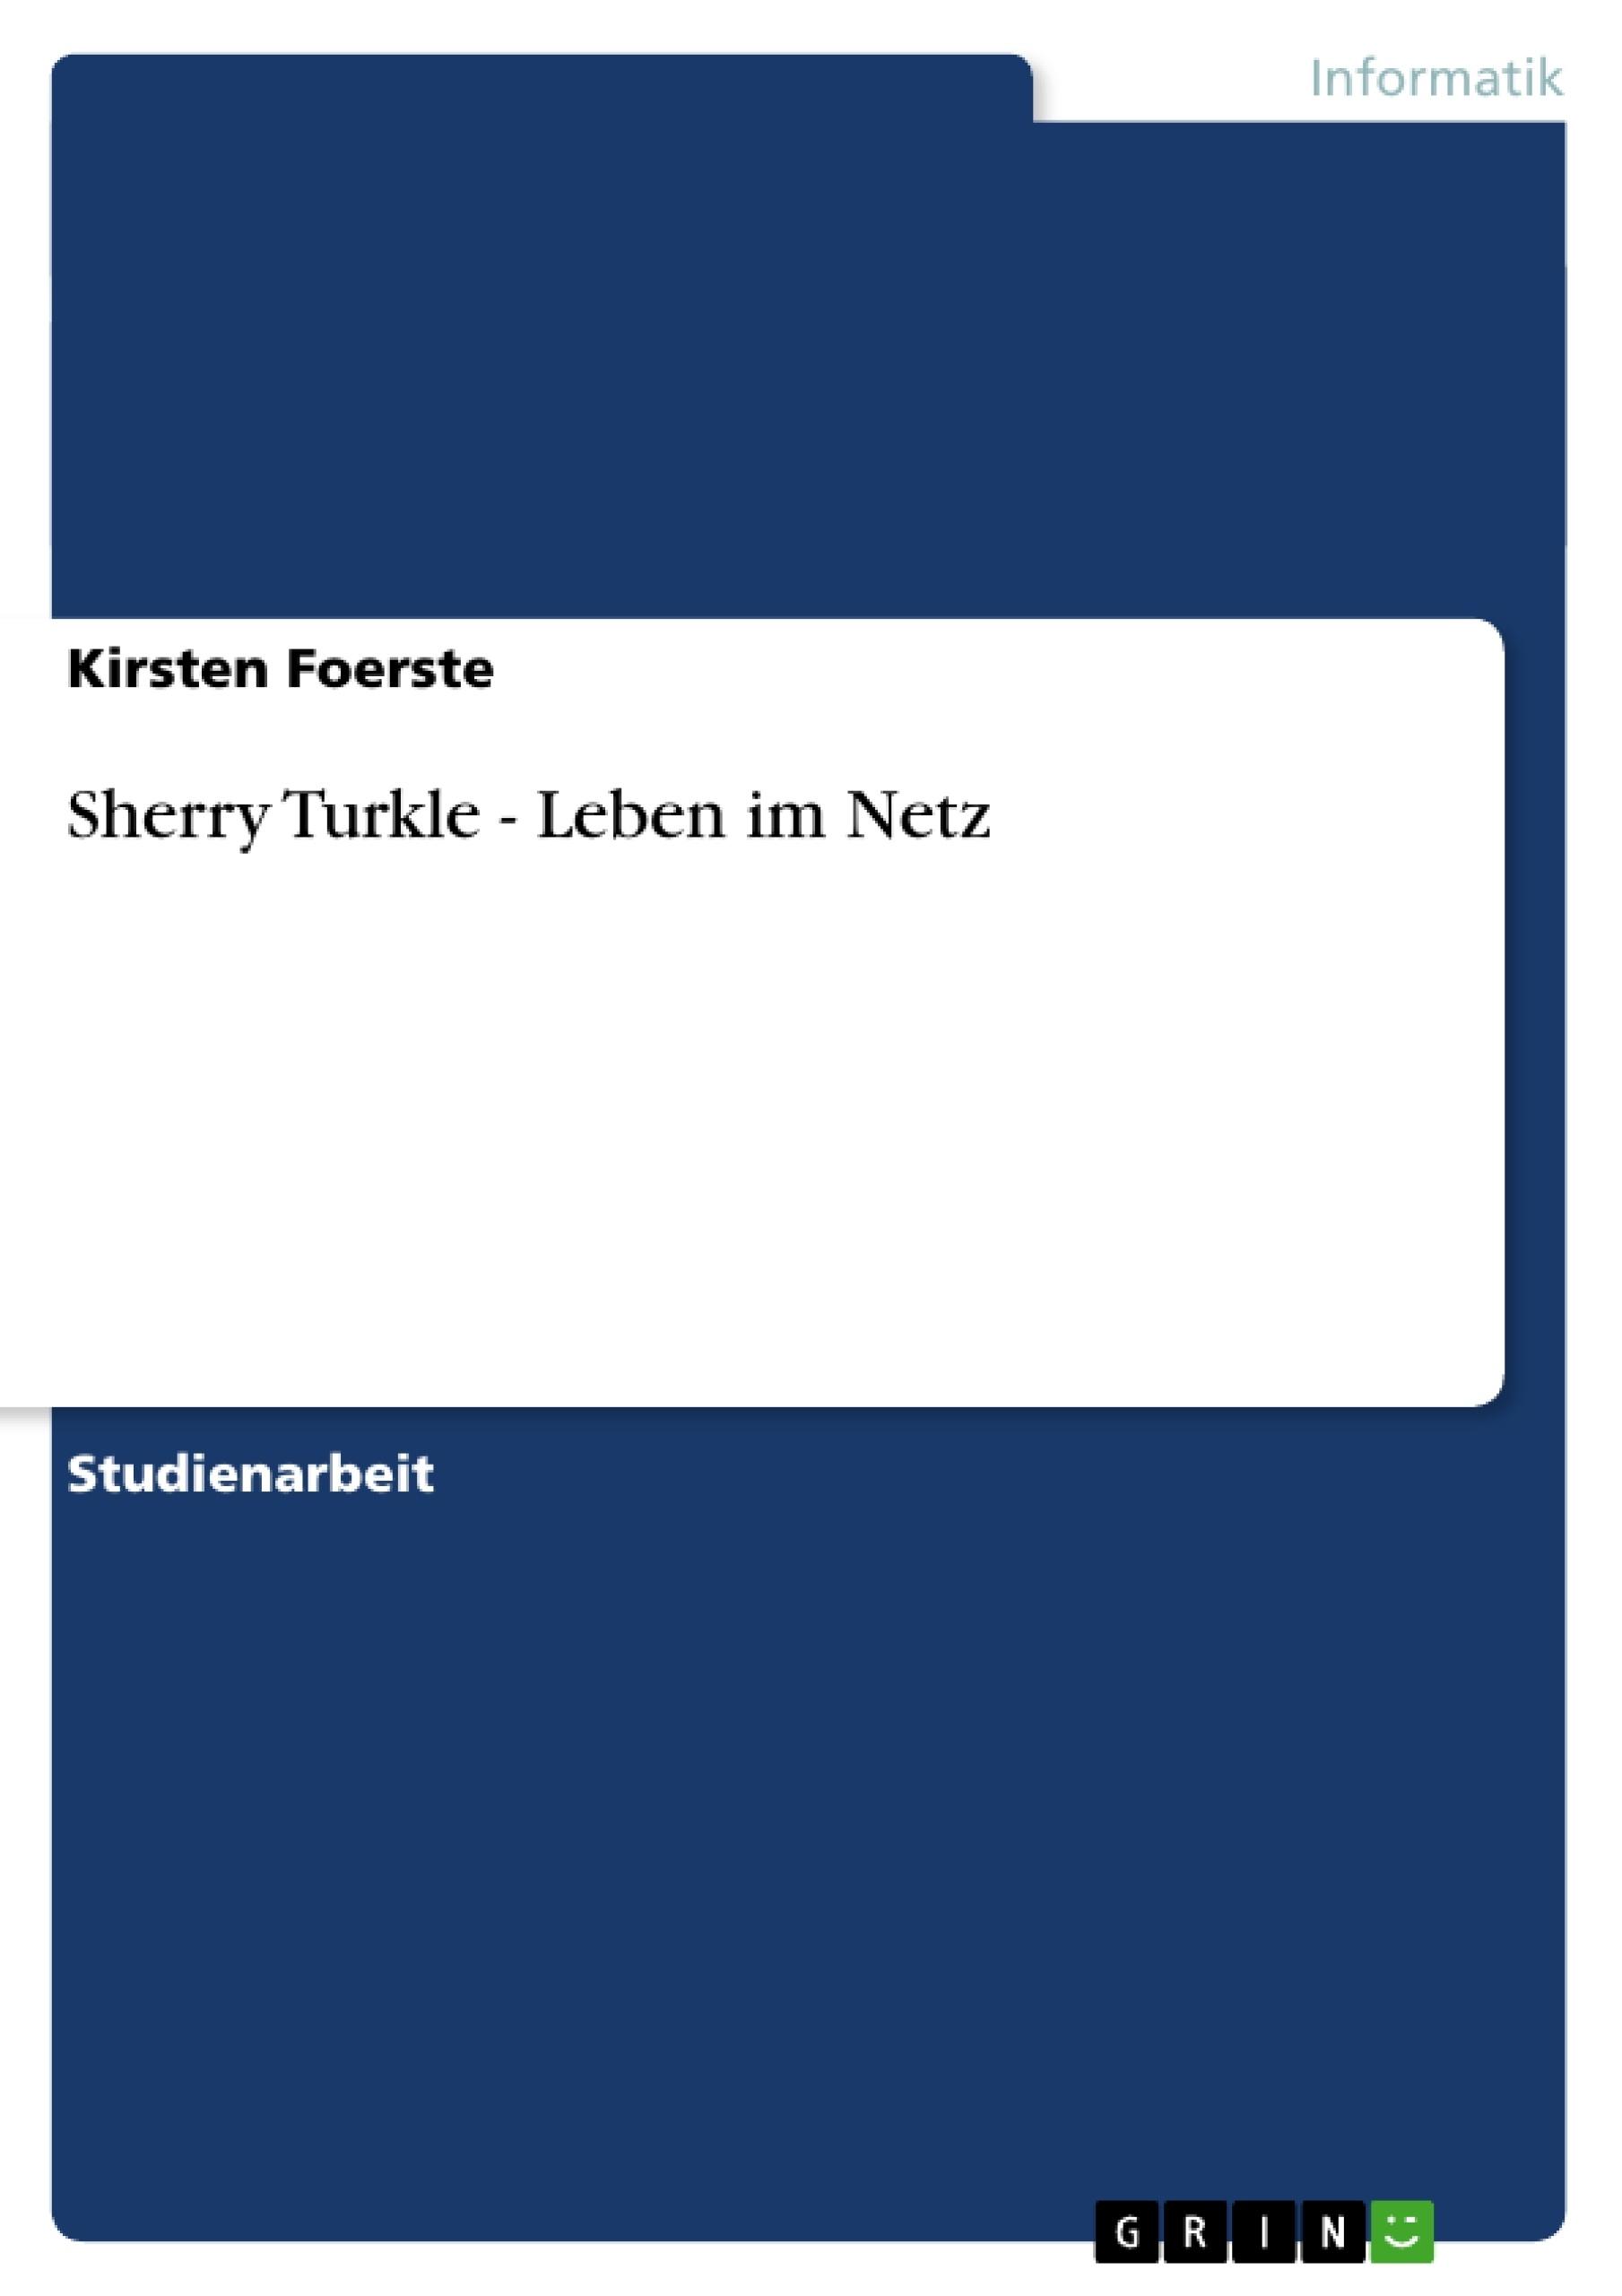 Titel: Sherry Turkle - Leben im Netz